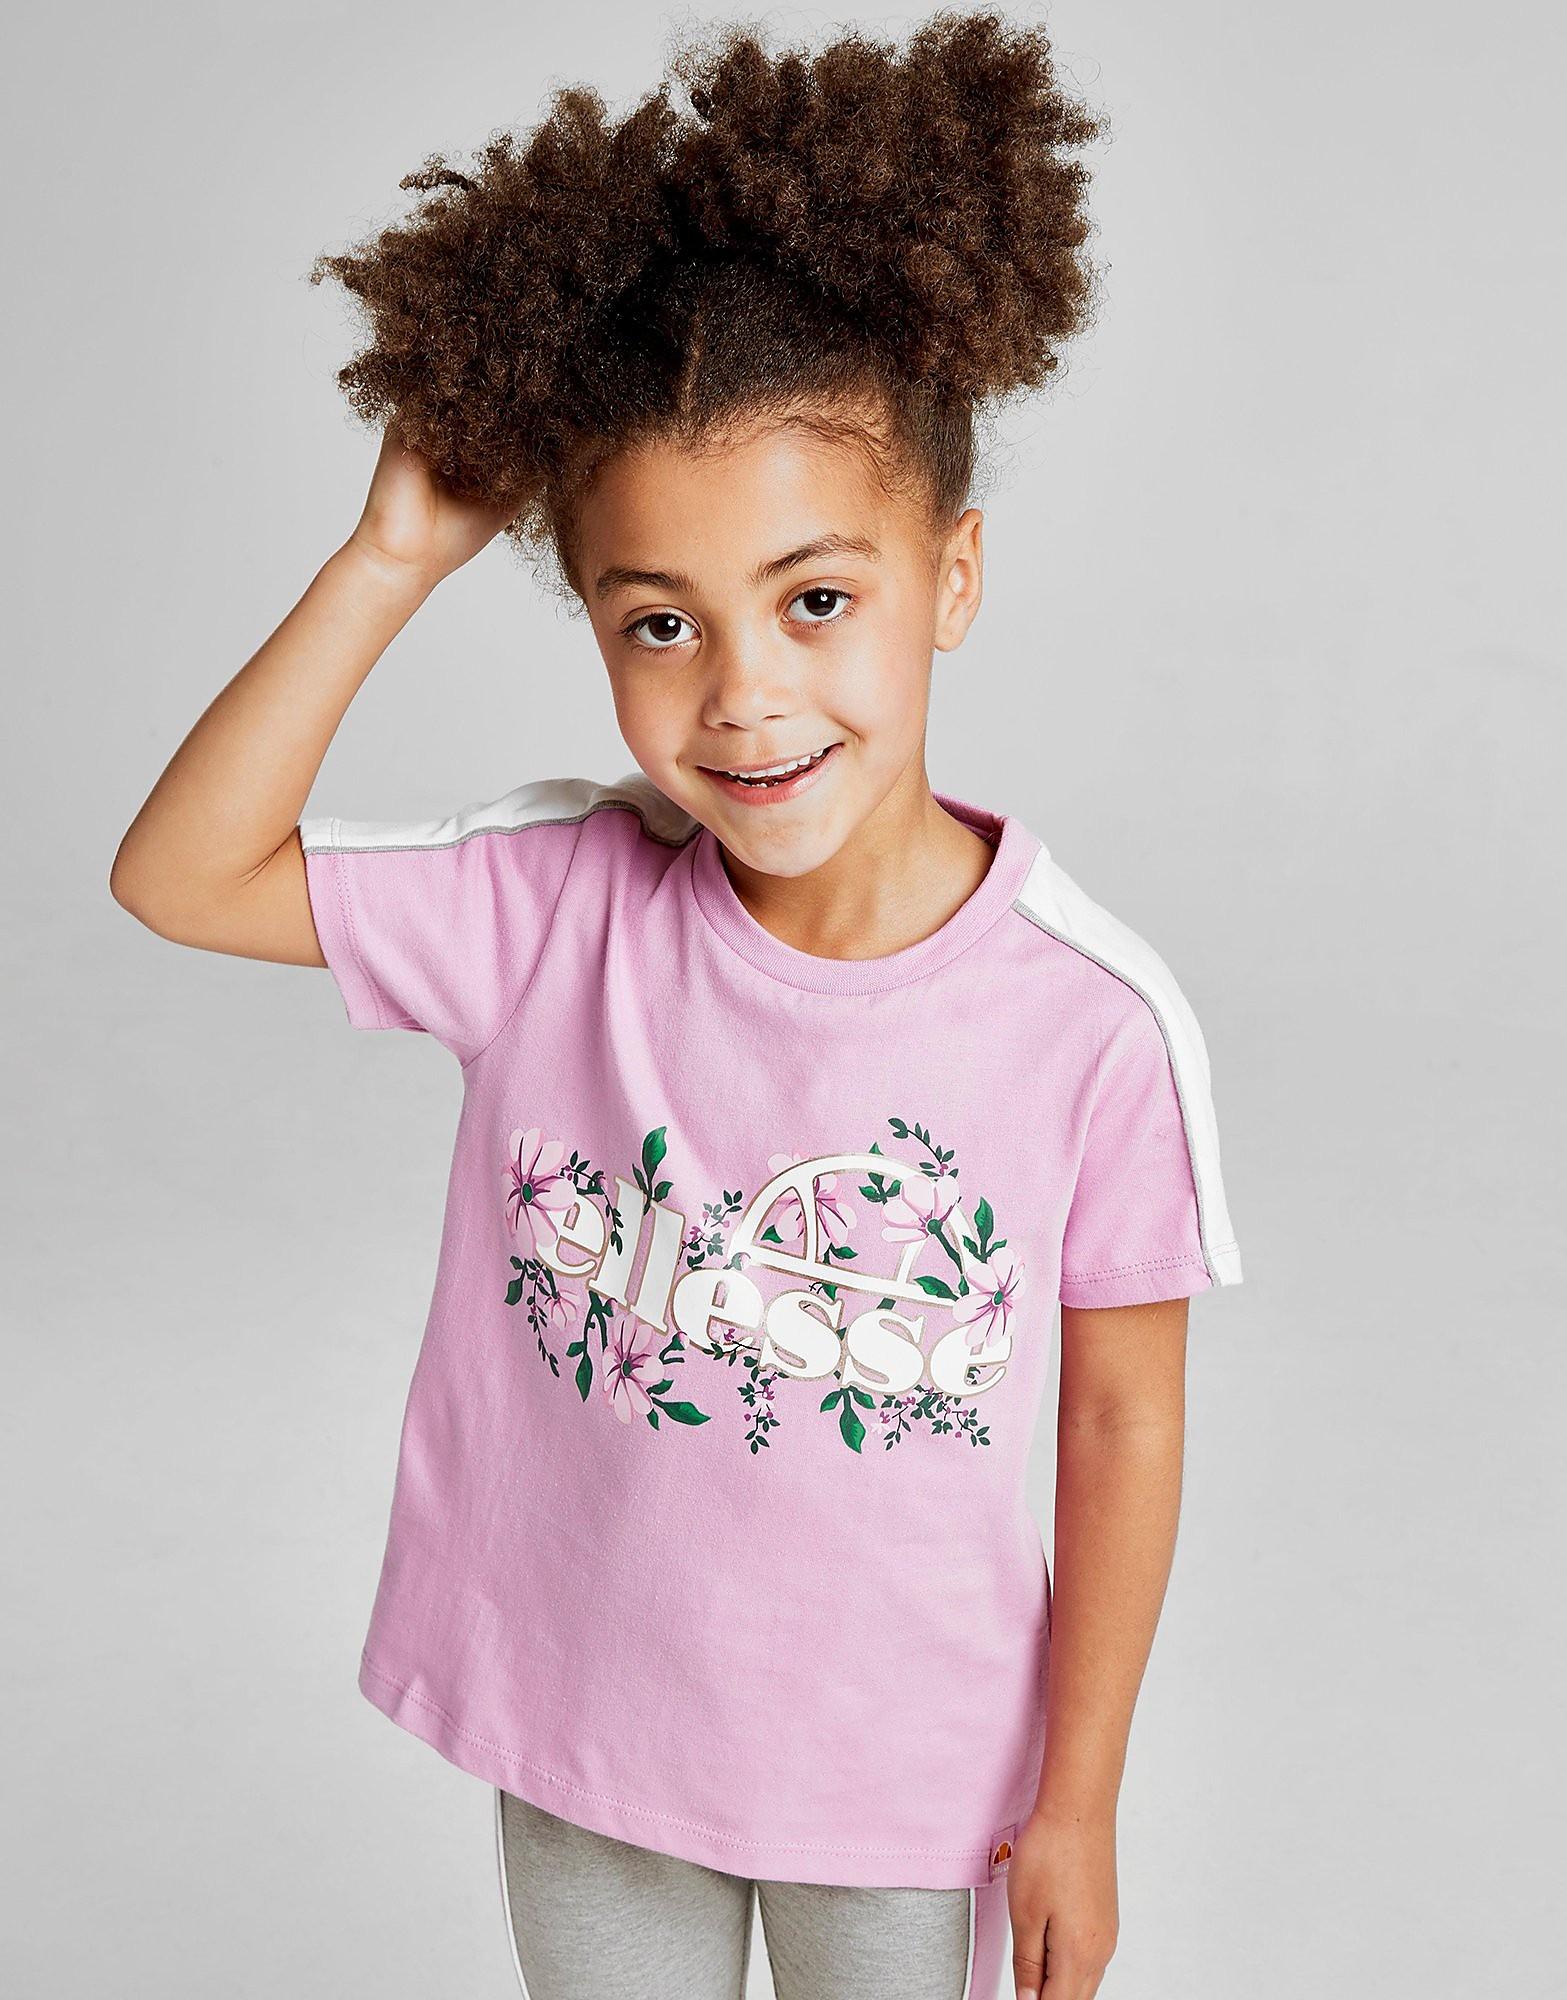 Ellesse Girls' Aster T-Shirt Children - alleen bij JD - Roze - Kind